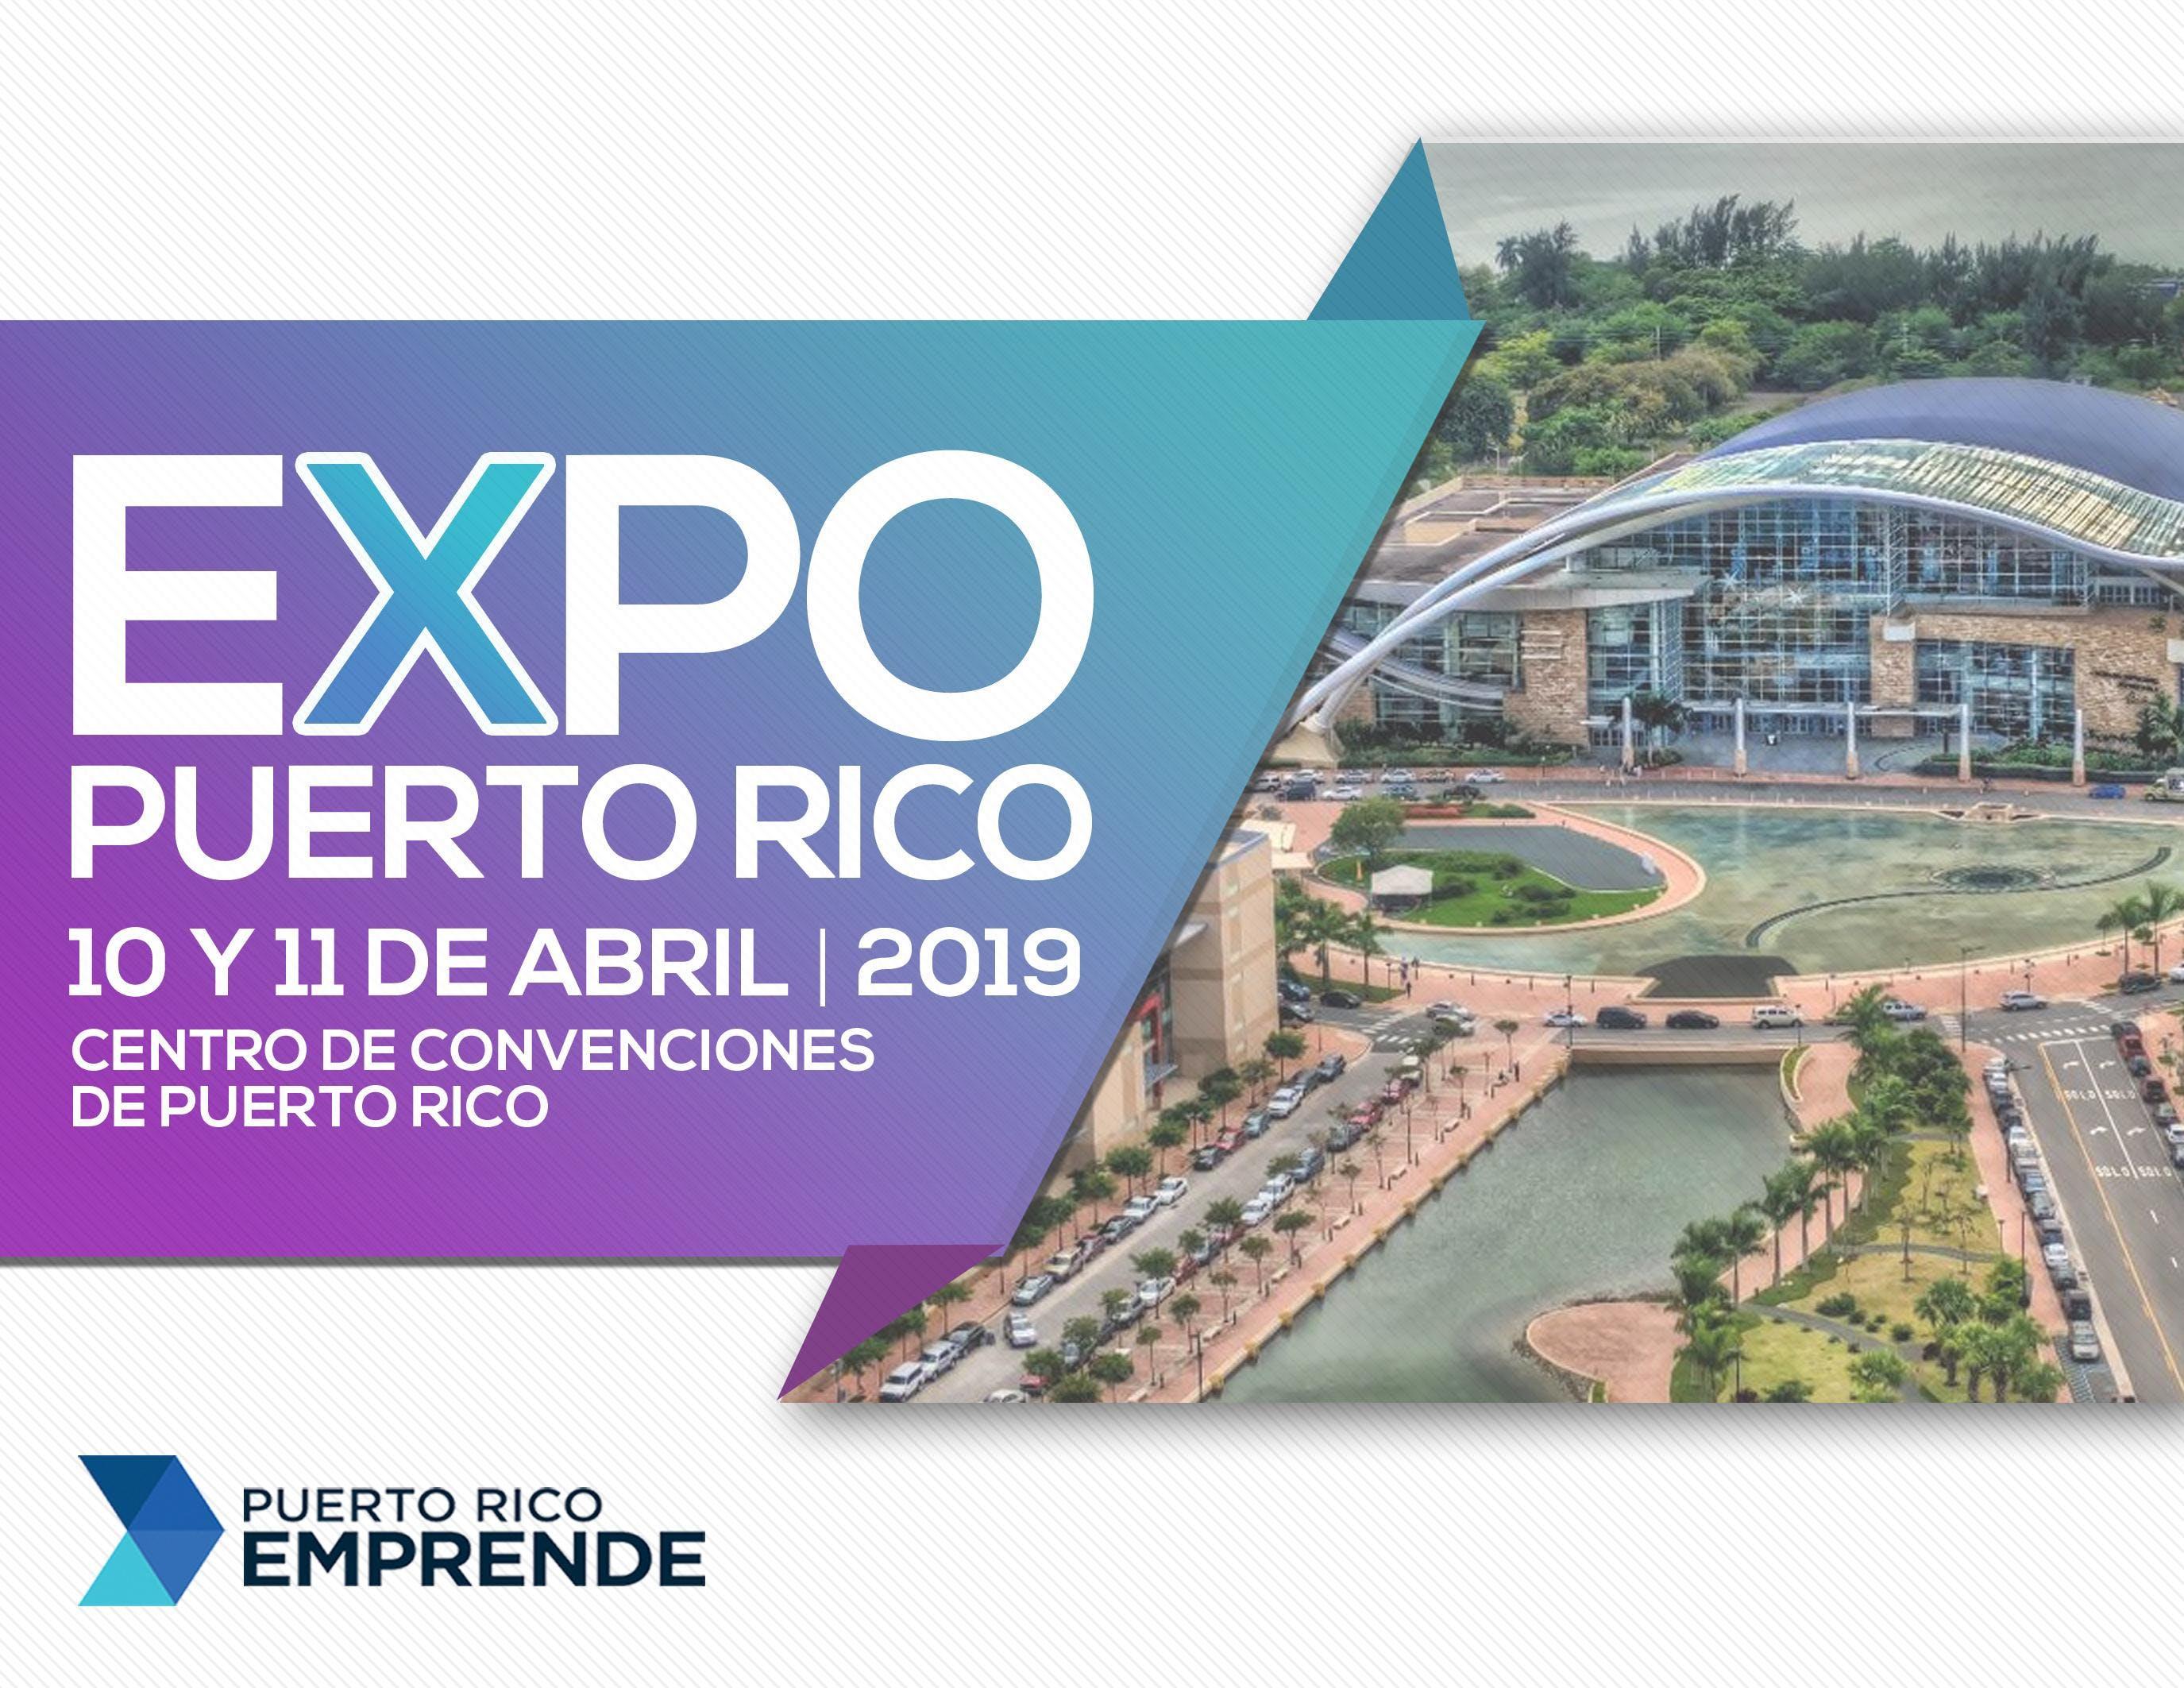 Expo Puerto Rico 2019